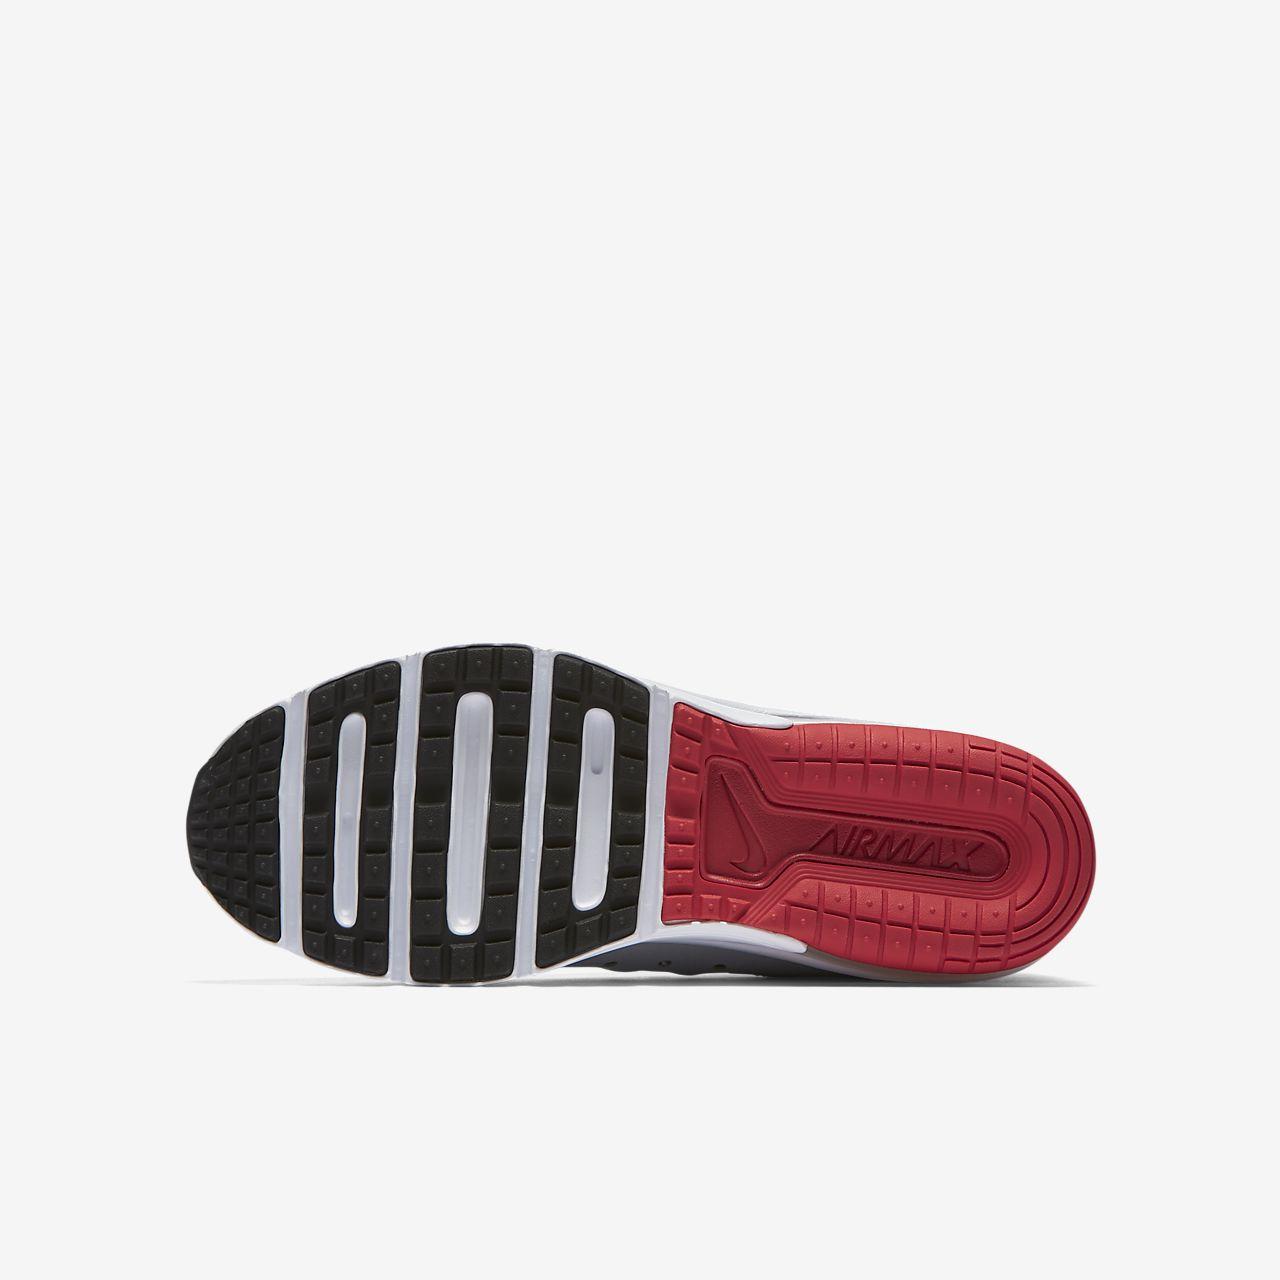 cd9e95525a Nike Air Max Sequent 3 Older Kids' Shoe. Nike.com CZ